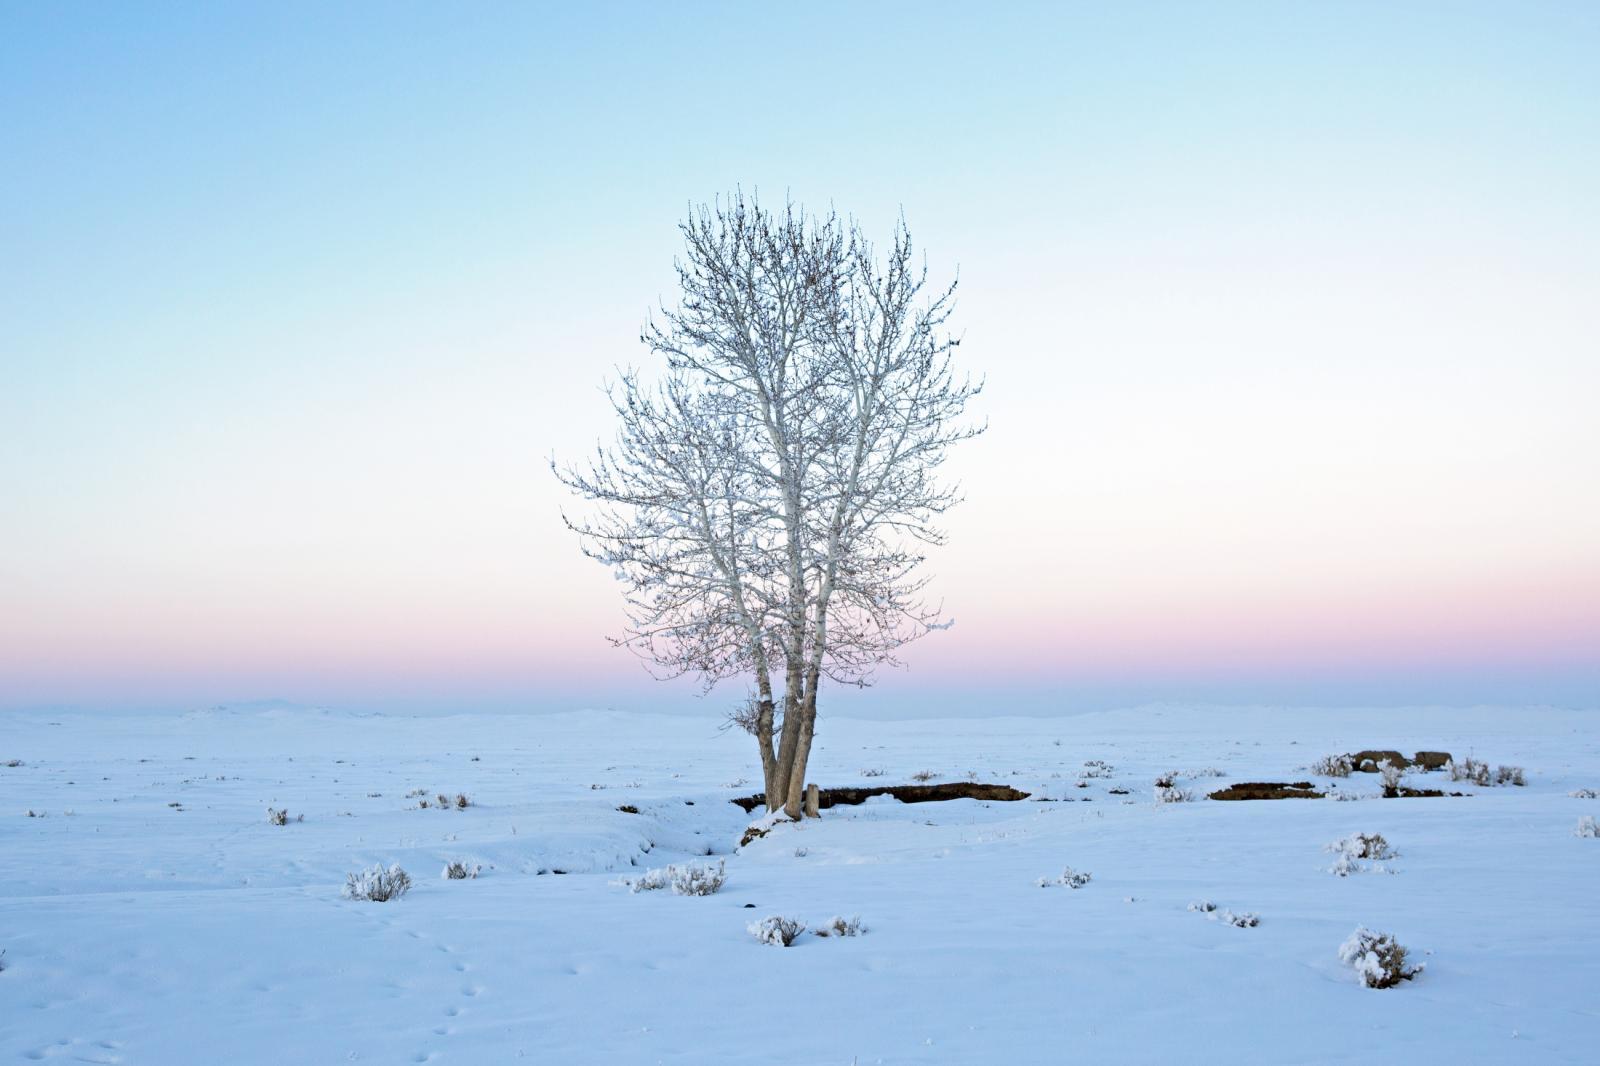 Photography image - Loading Mongolia_For_Website-001.JPG